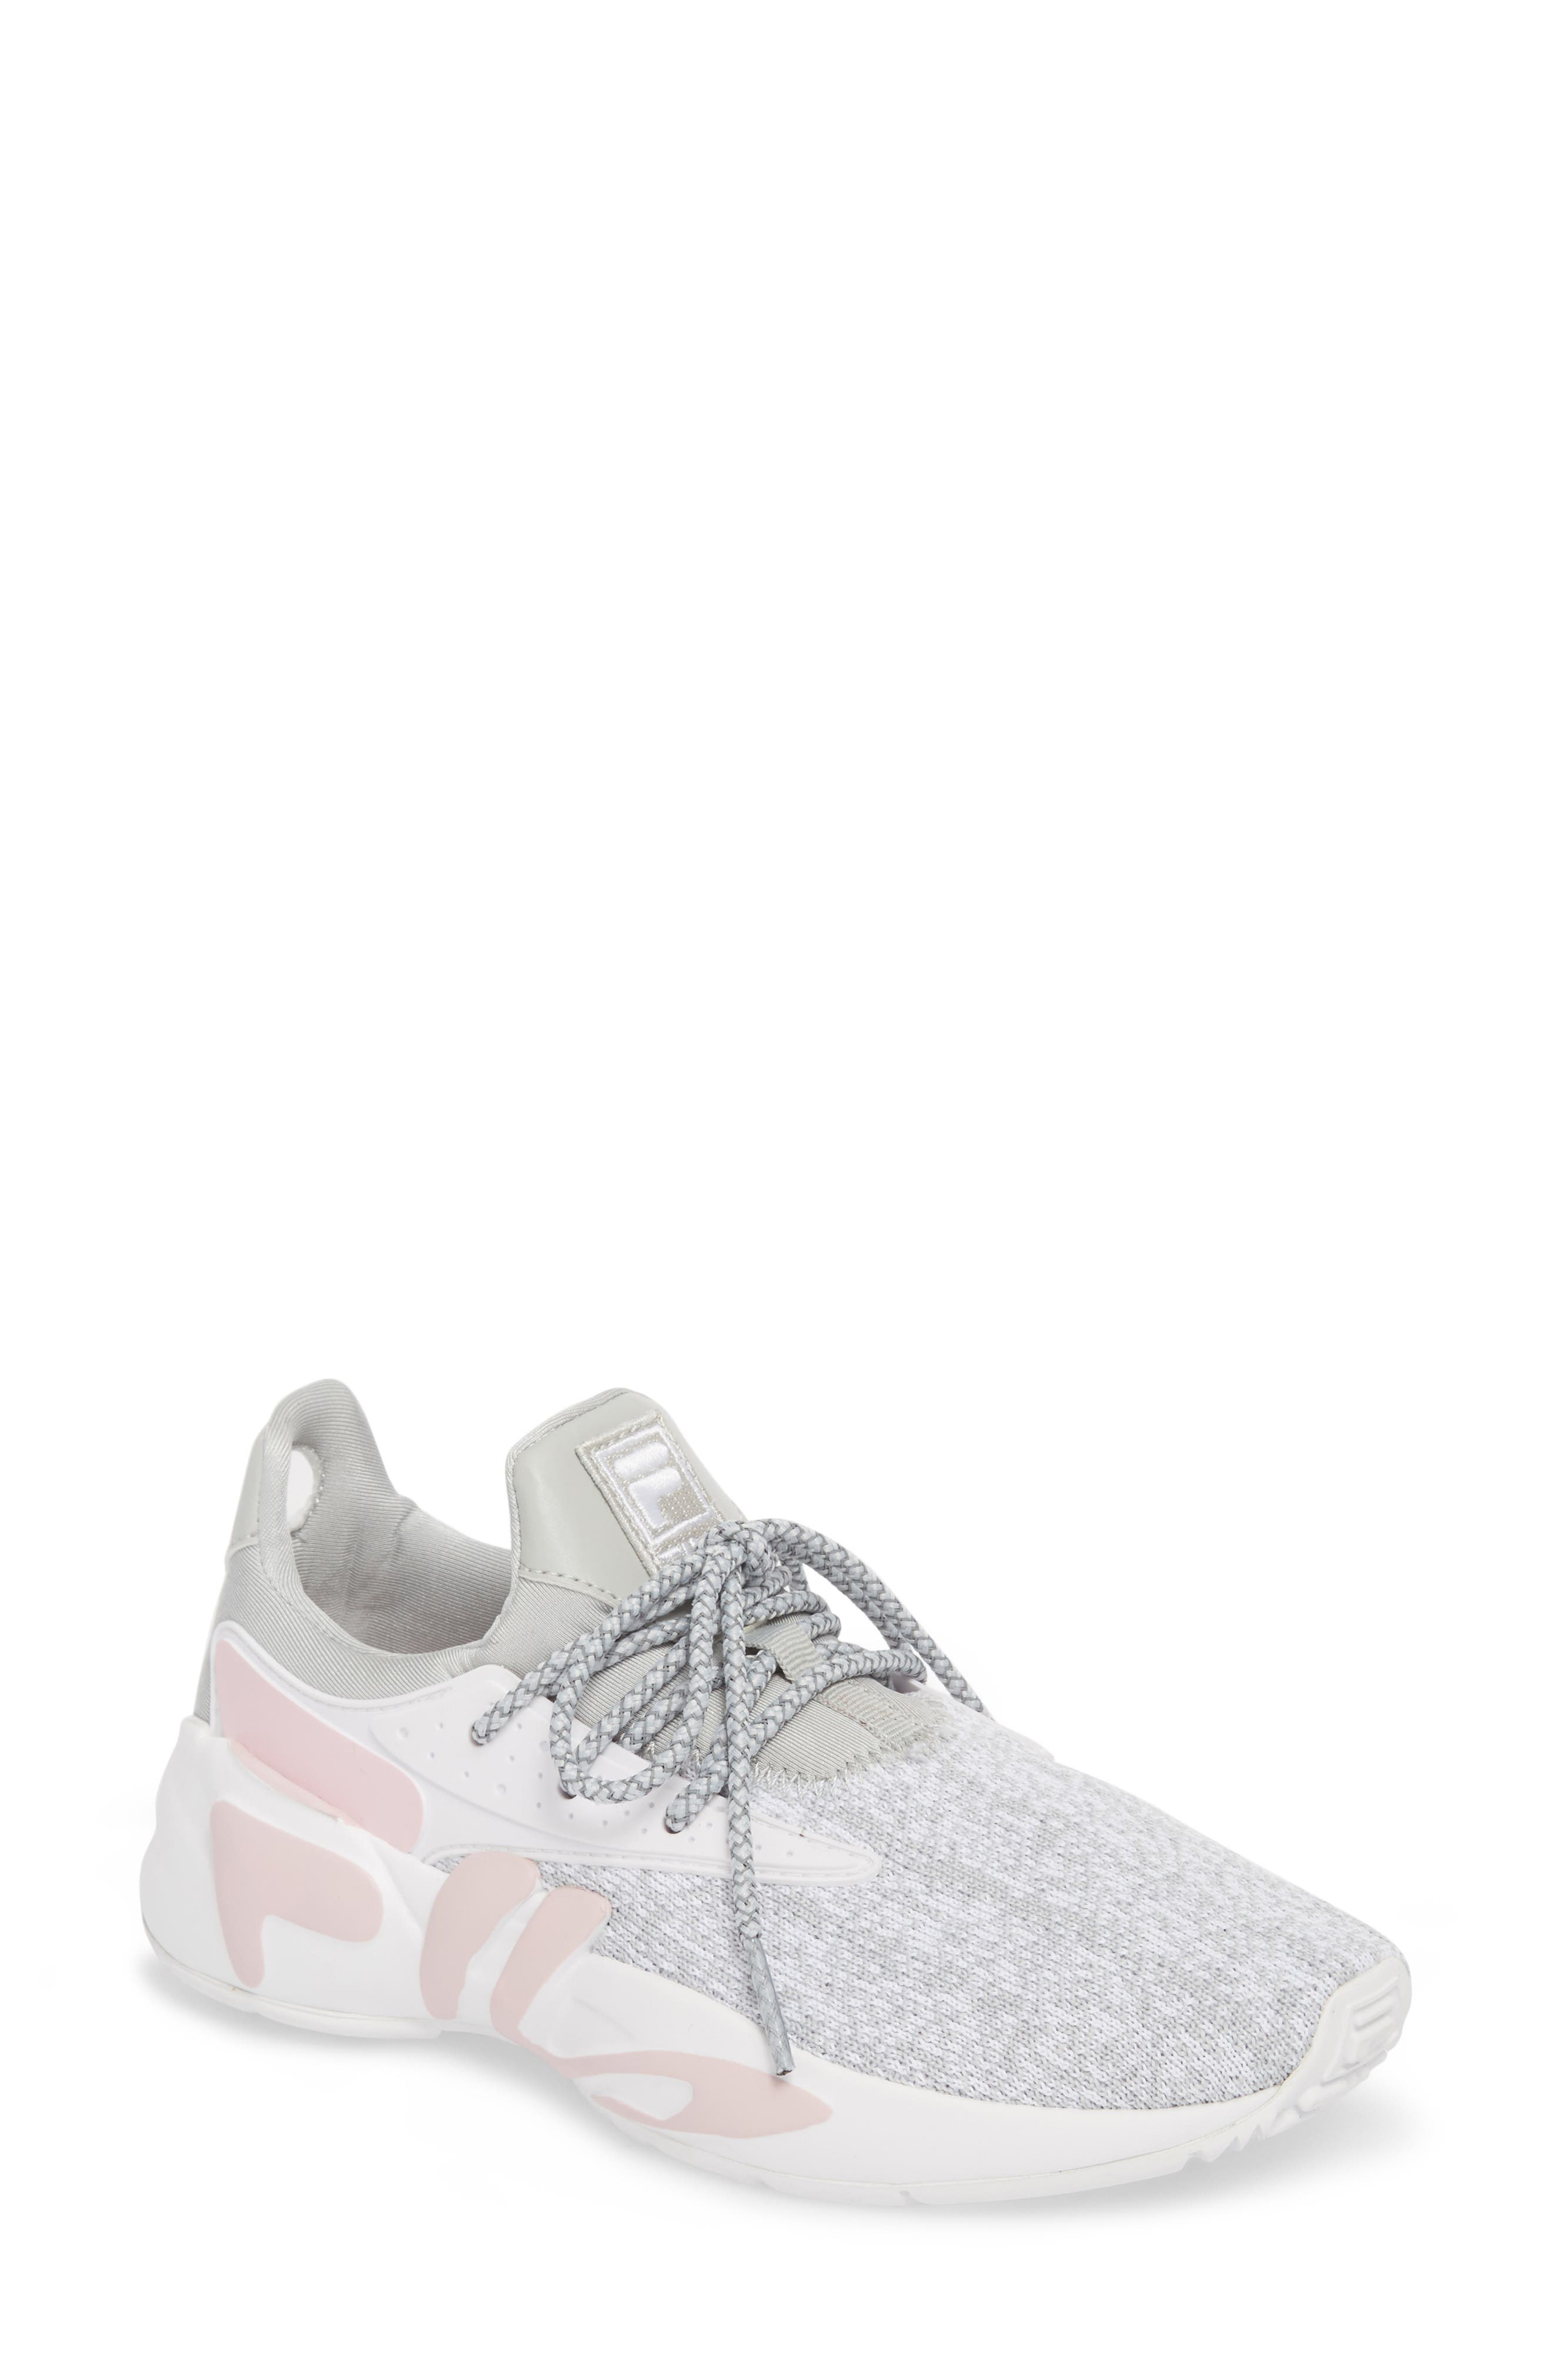 Mindbreaker 2.0 Sneaker,                             Main thumbnail 1, color,                             070